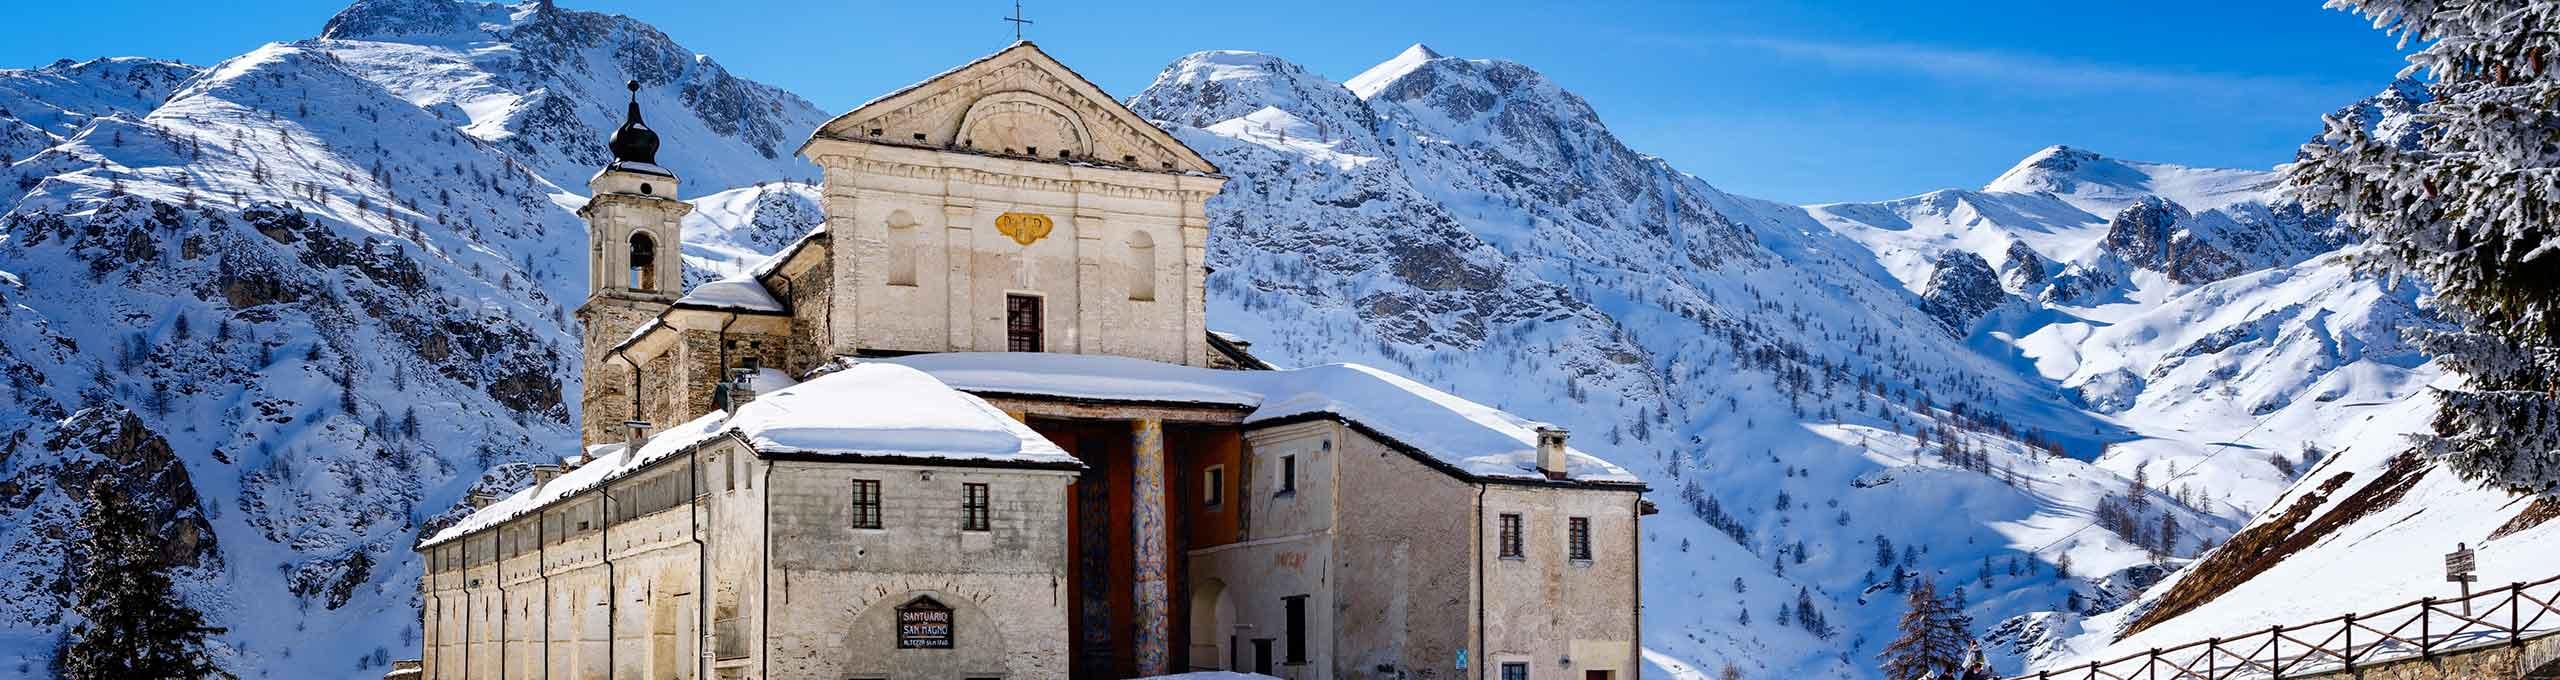 Castelmagno, Valle Grana e Maira